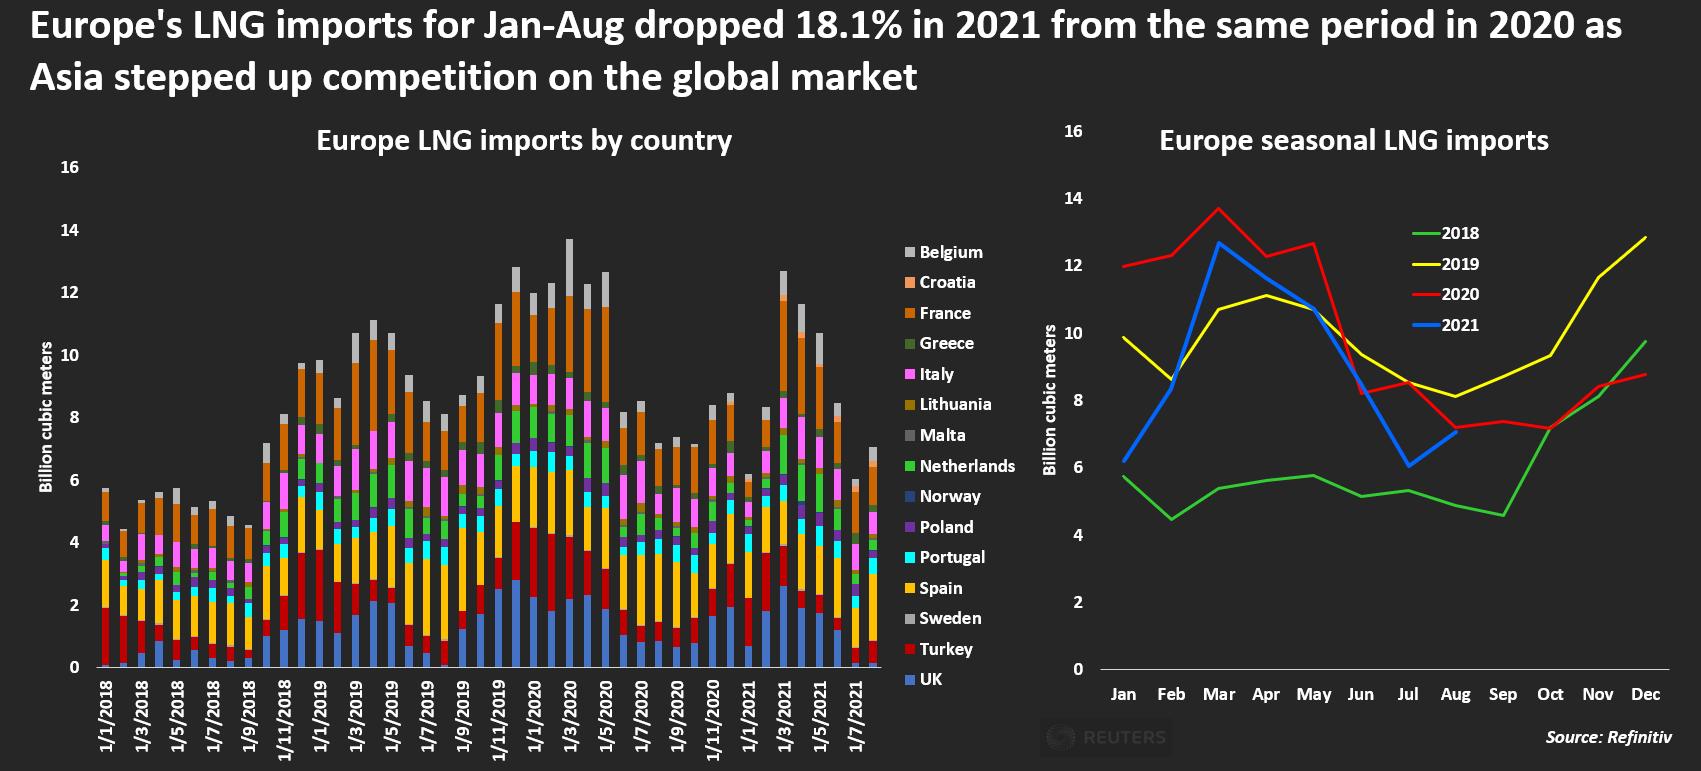 Europe LNG imports